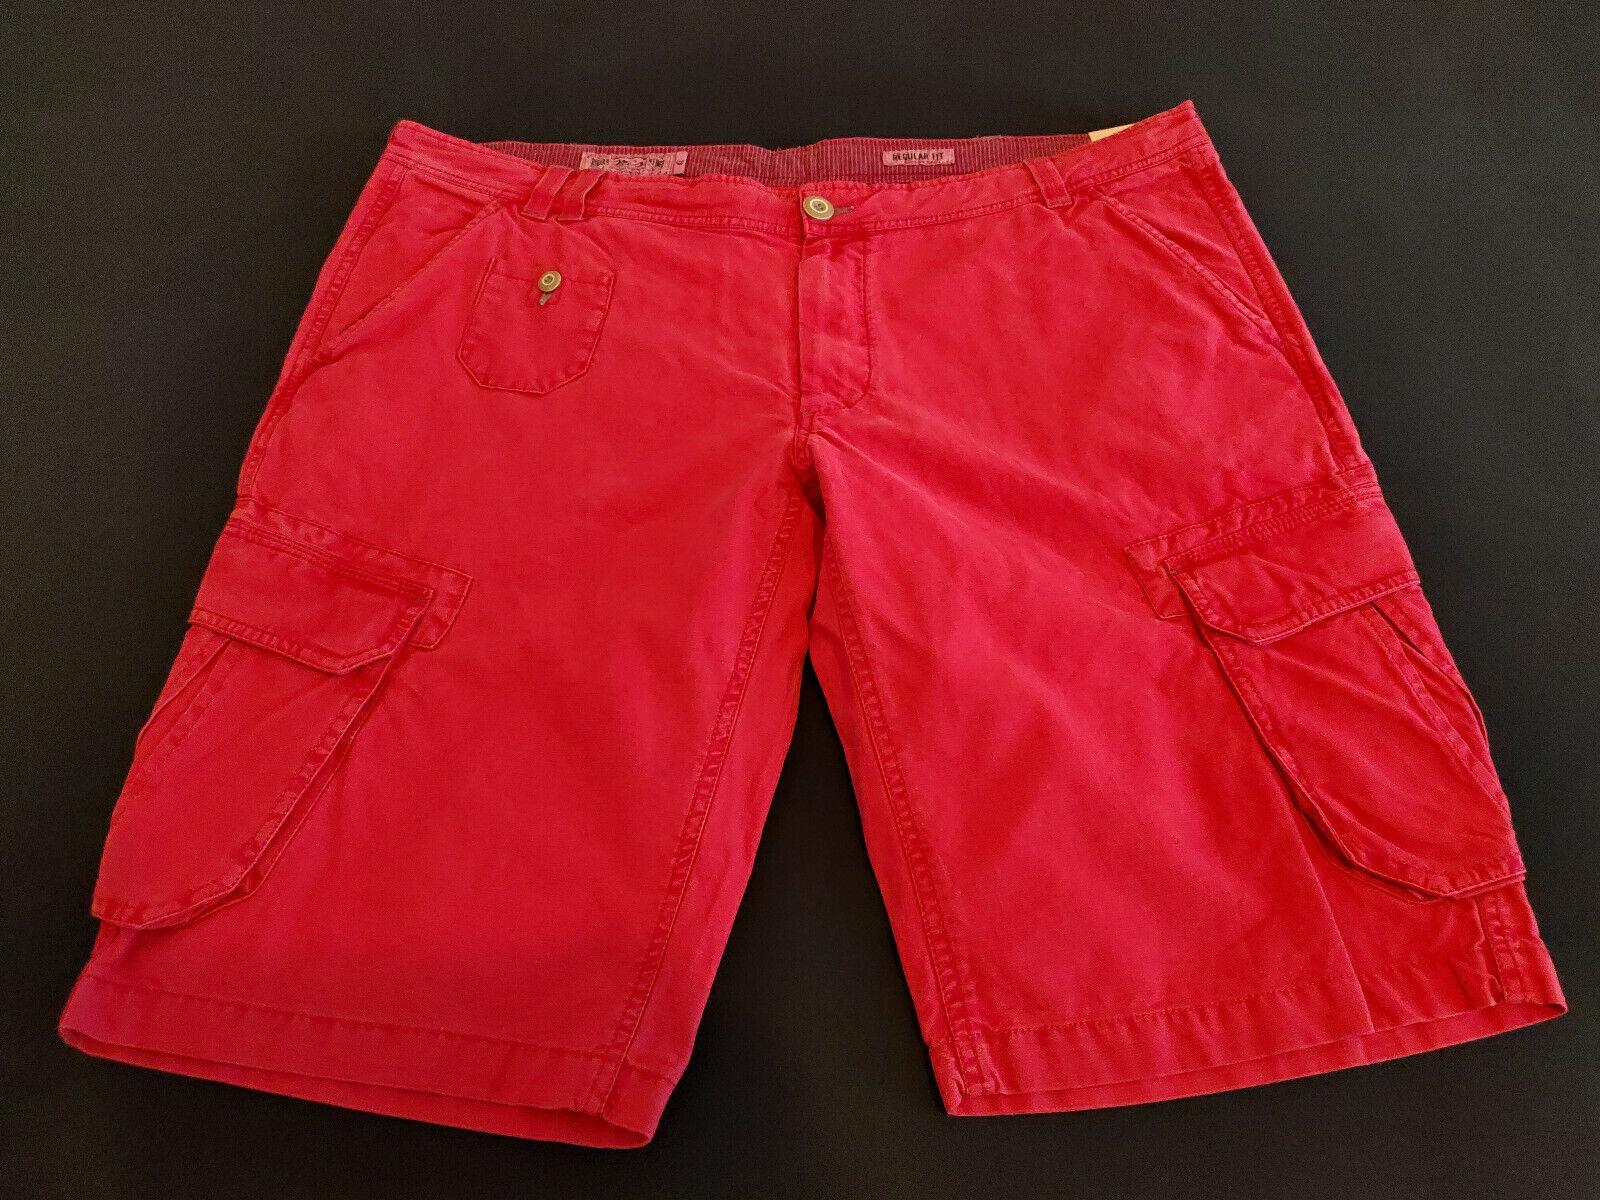 Malboro CLASSICS MCS, Pantaloncini, Tg. US 42, rosso, Lino + + + BW, UVP = 95,- EURO, NUOVO  c7f8ef